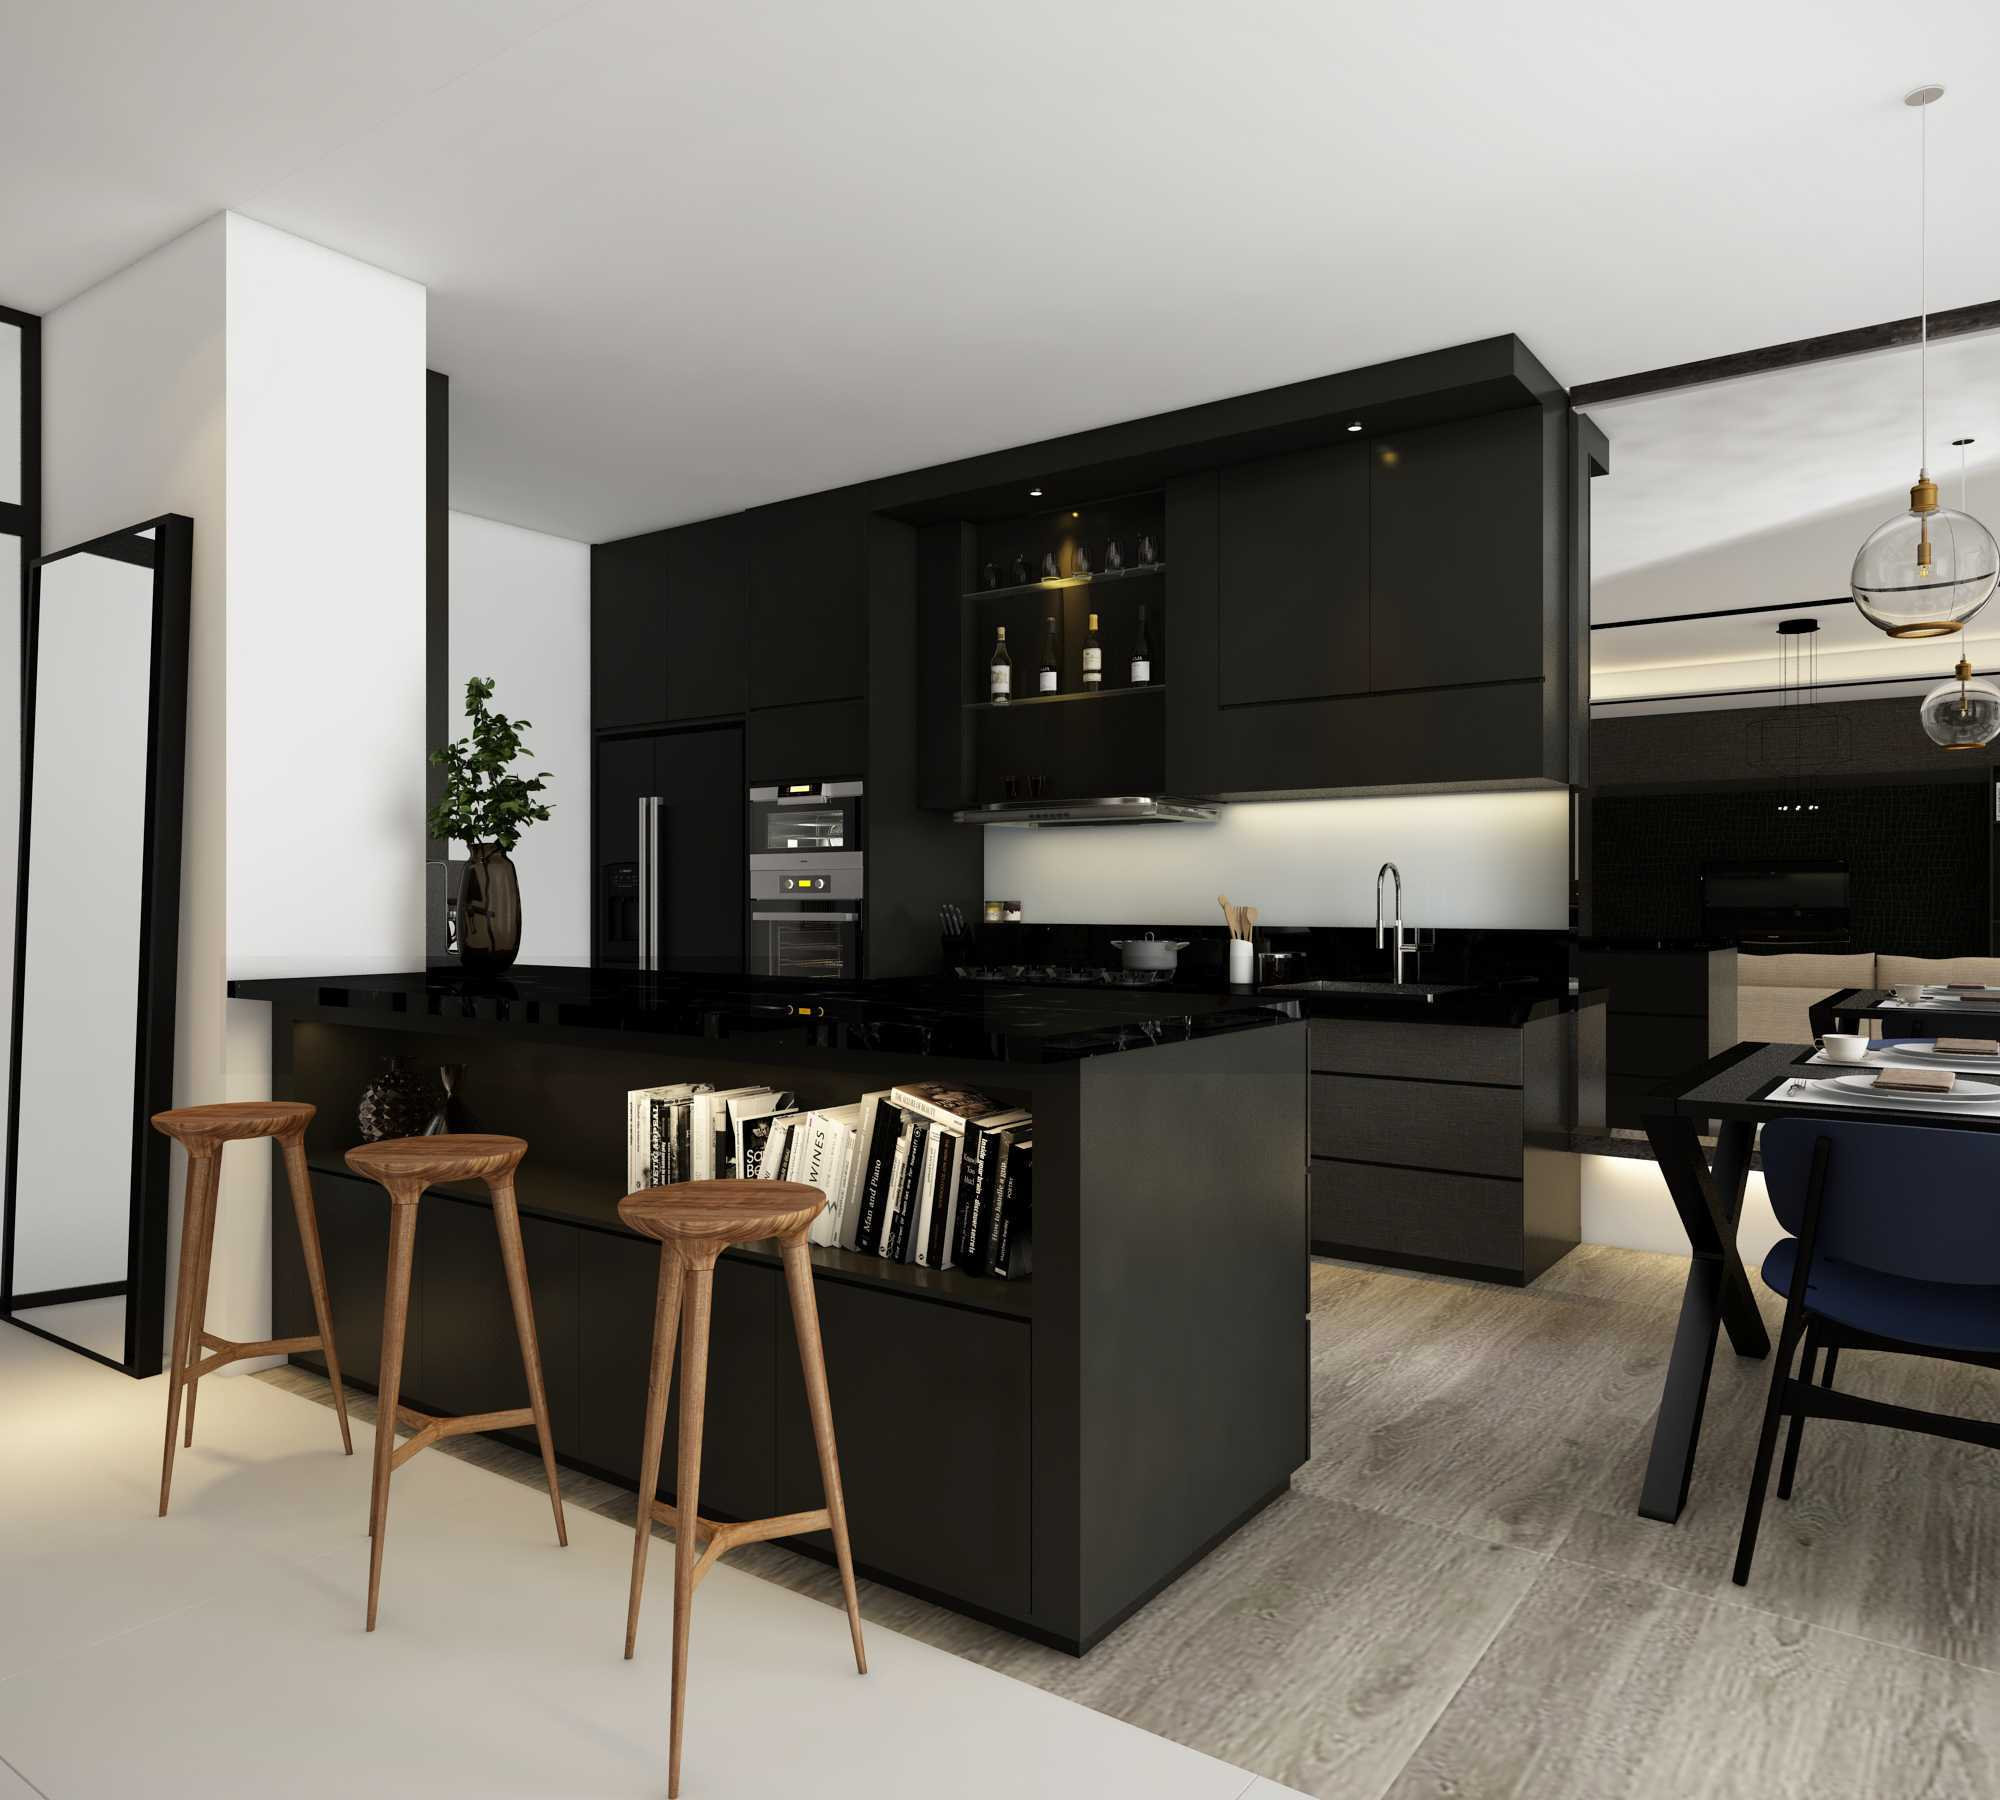 La.casa Apartment Season City Jakarta Jakarta Barat, Indonesia Jakarta Barat, Indonesia Kitchen Modern  12200